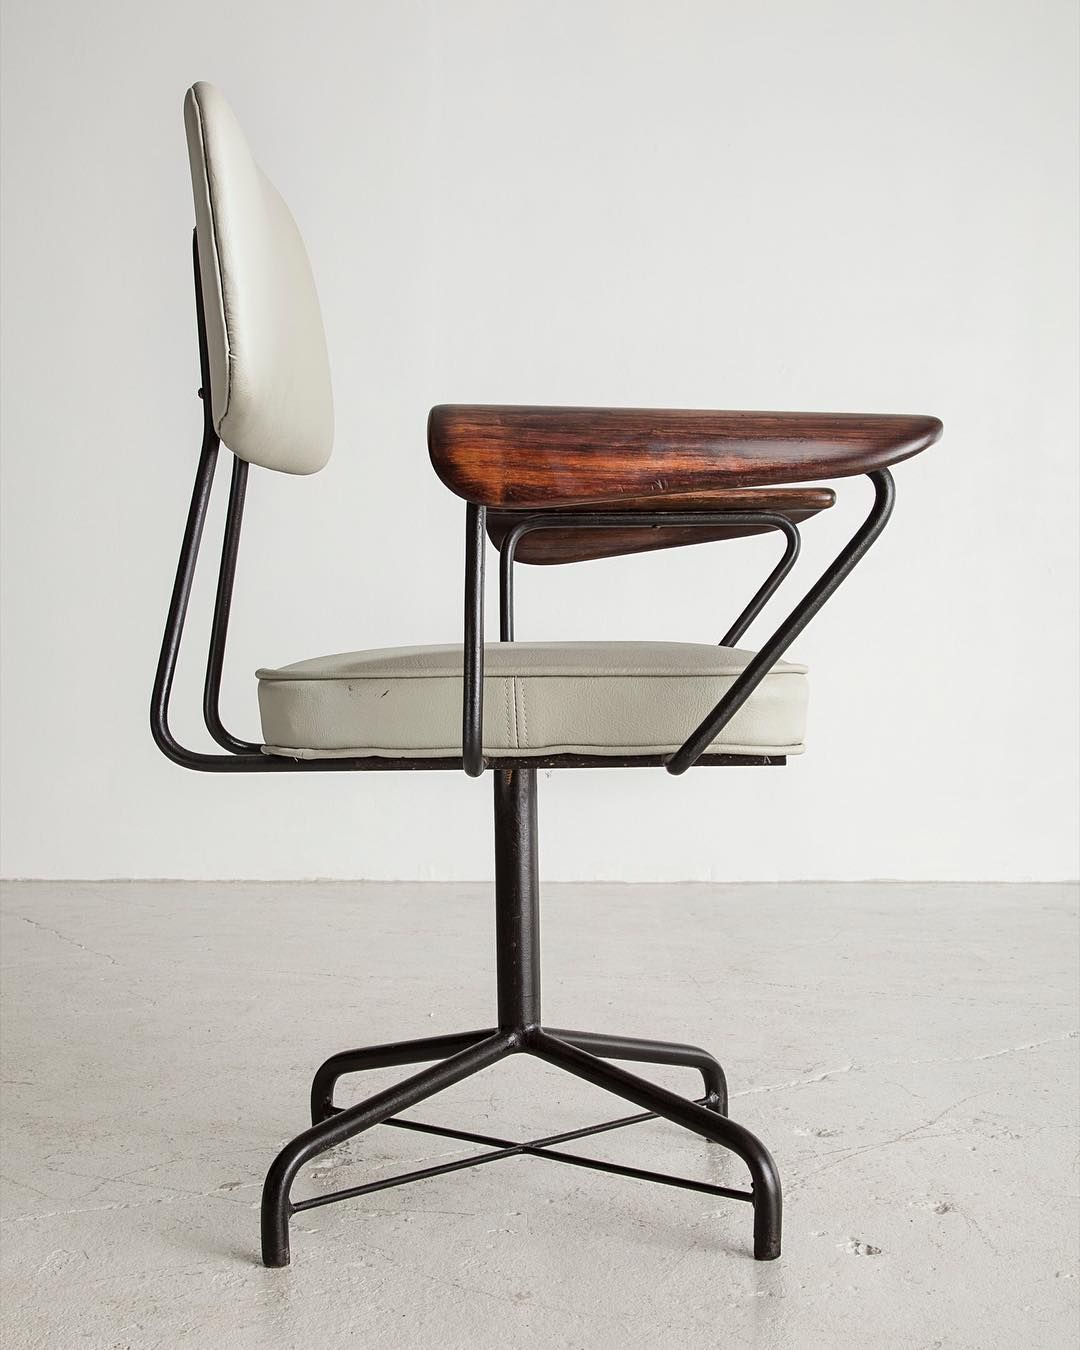 Midcentury modern · carlohauner desk chair designed for forma in the 1950s